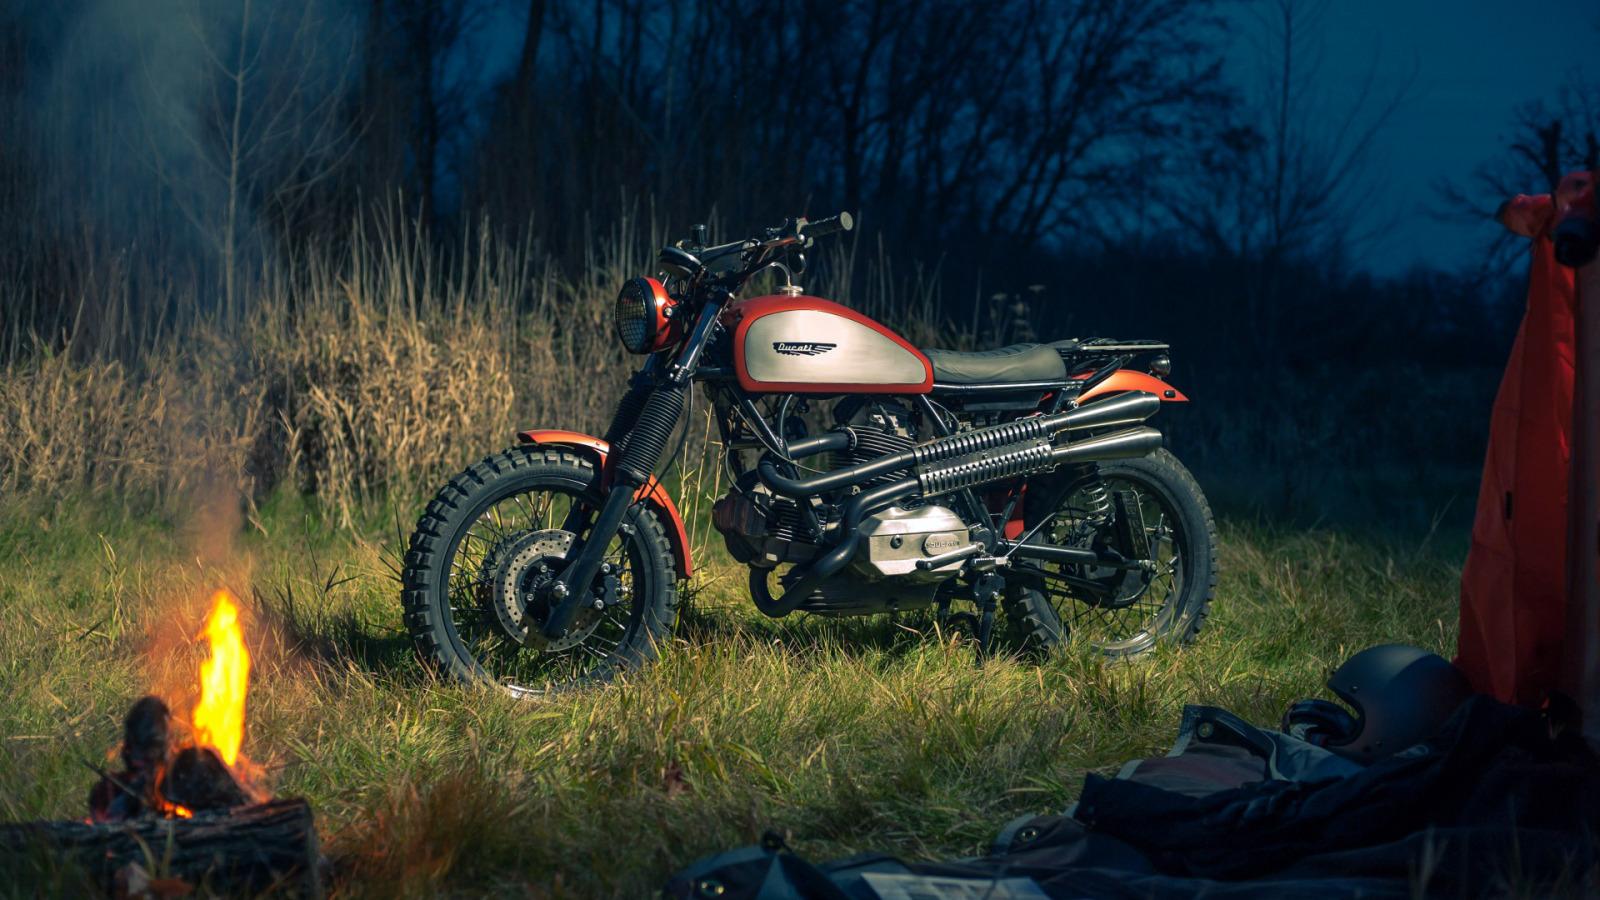 https://img2.goodfon.ru/original/1600x900/b/47/vecher-koster-priroda-motocikl.jpg